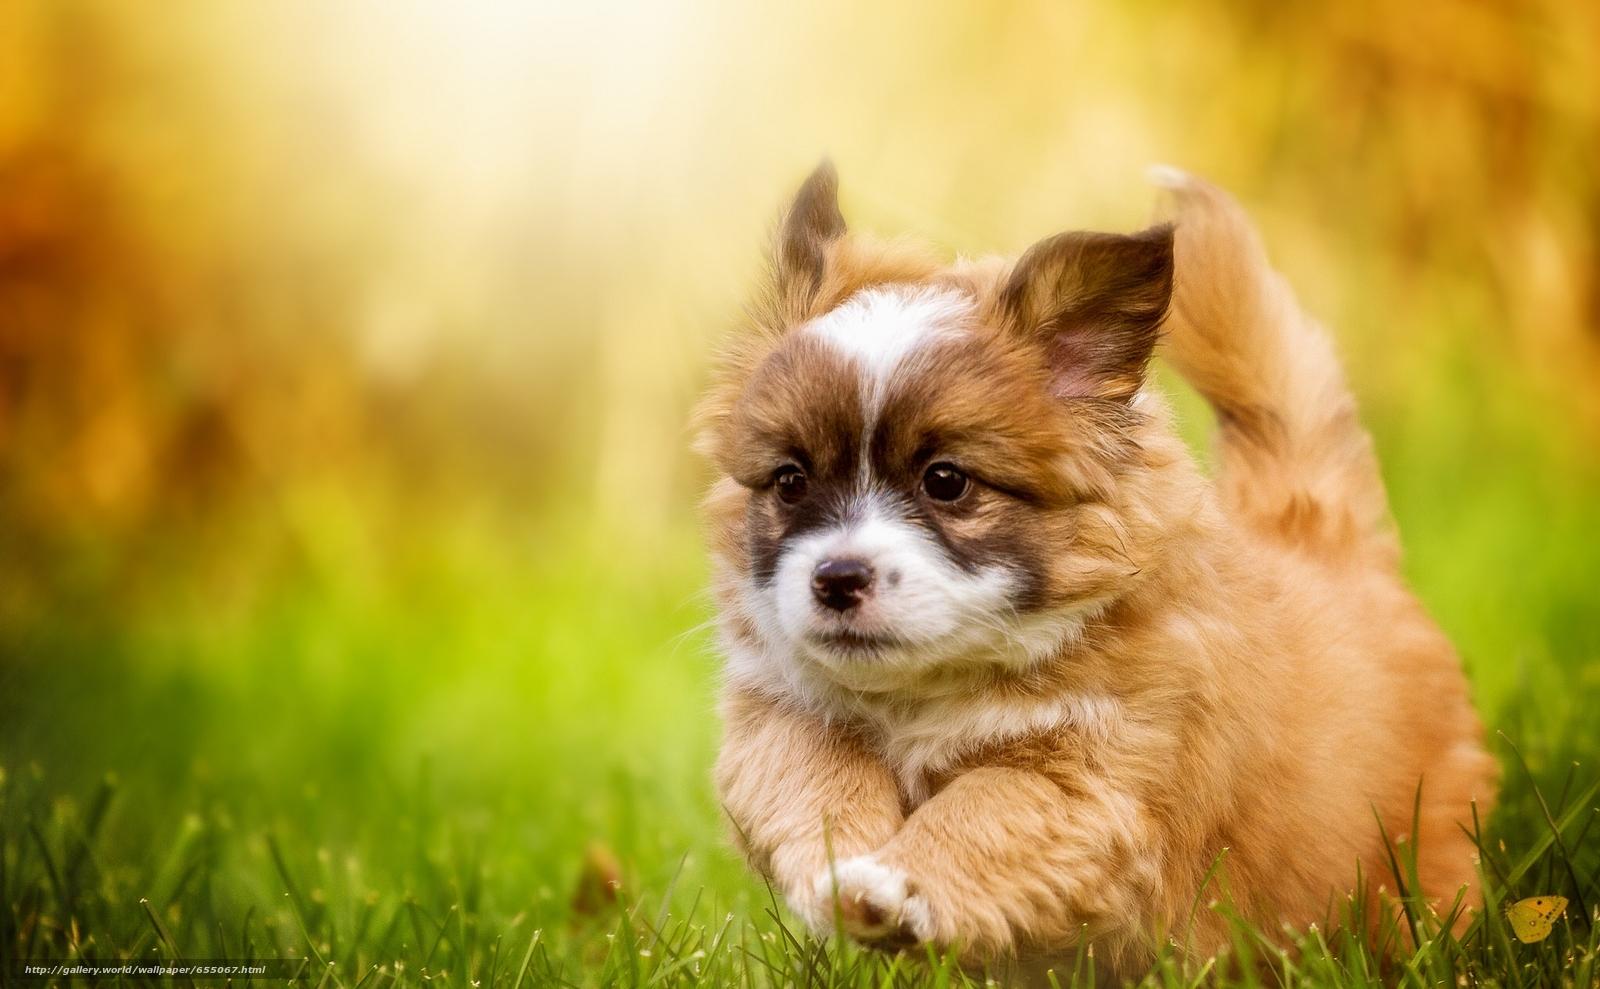 Tlcharger fond d 39 ecran chien chiot tourn e fonds d 39 ecran for Fond ecran chiot